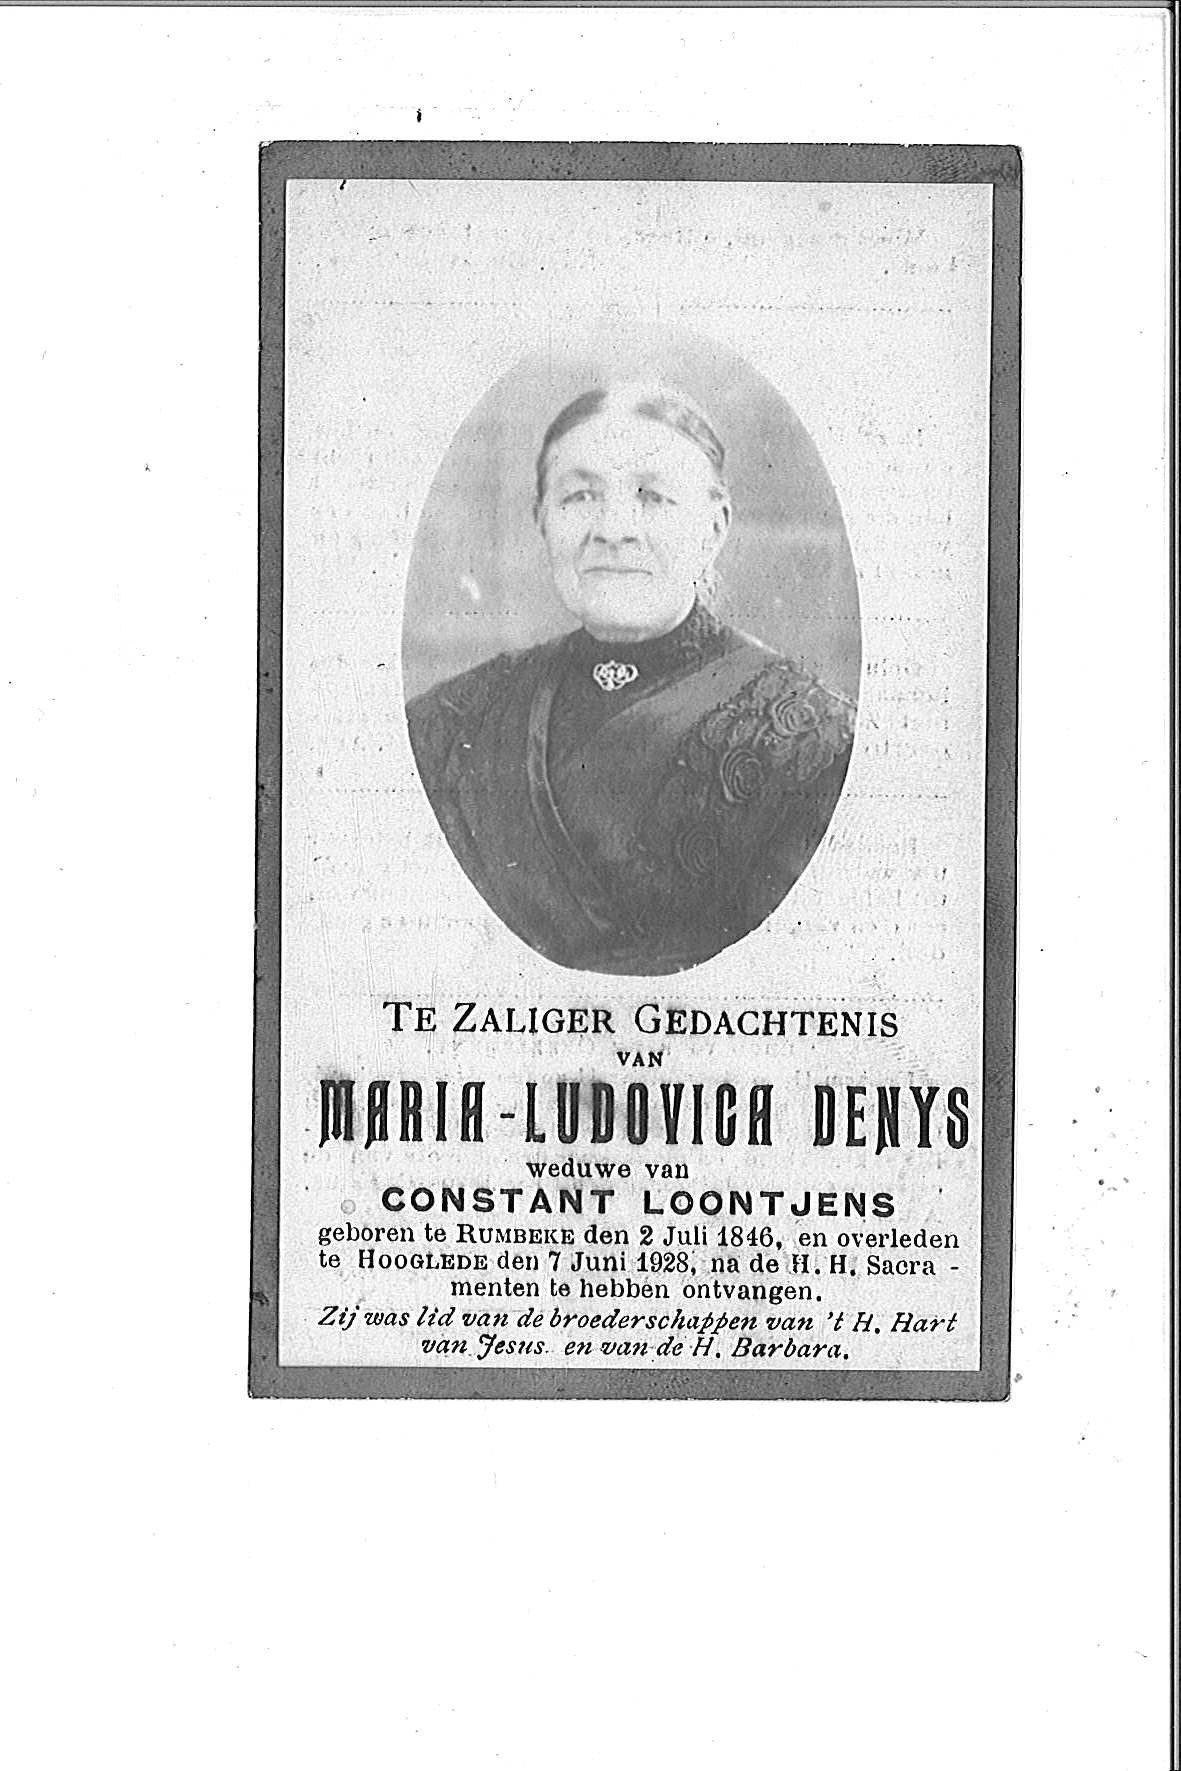 Maria-Ludovica(1928)20150415104000_00042.jpg